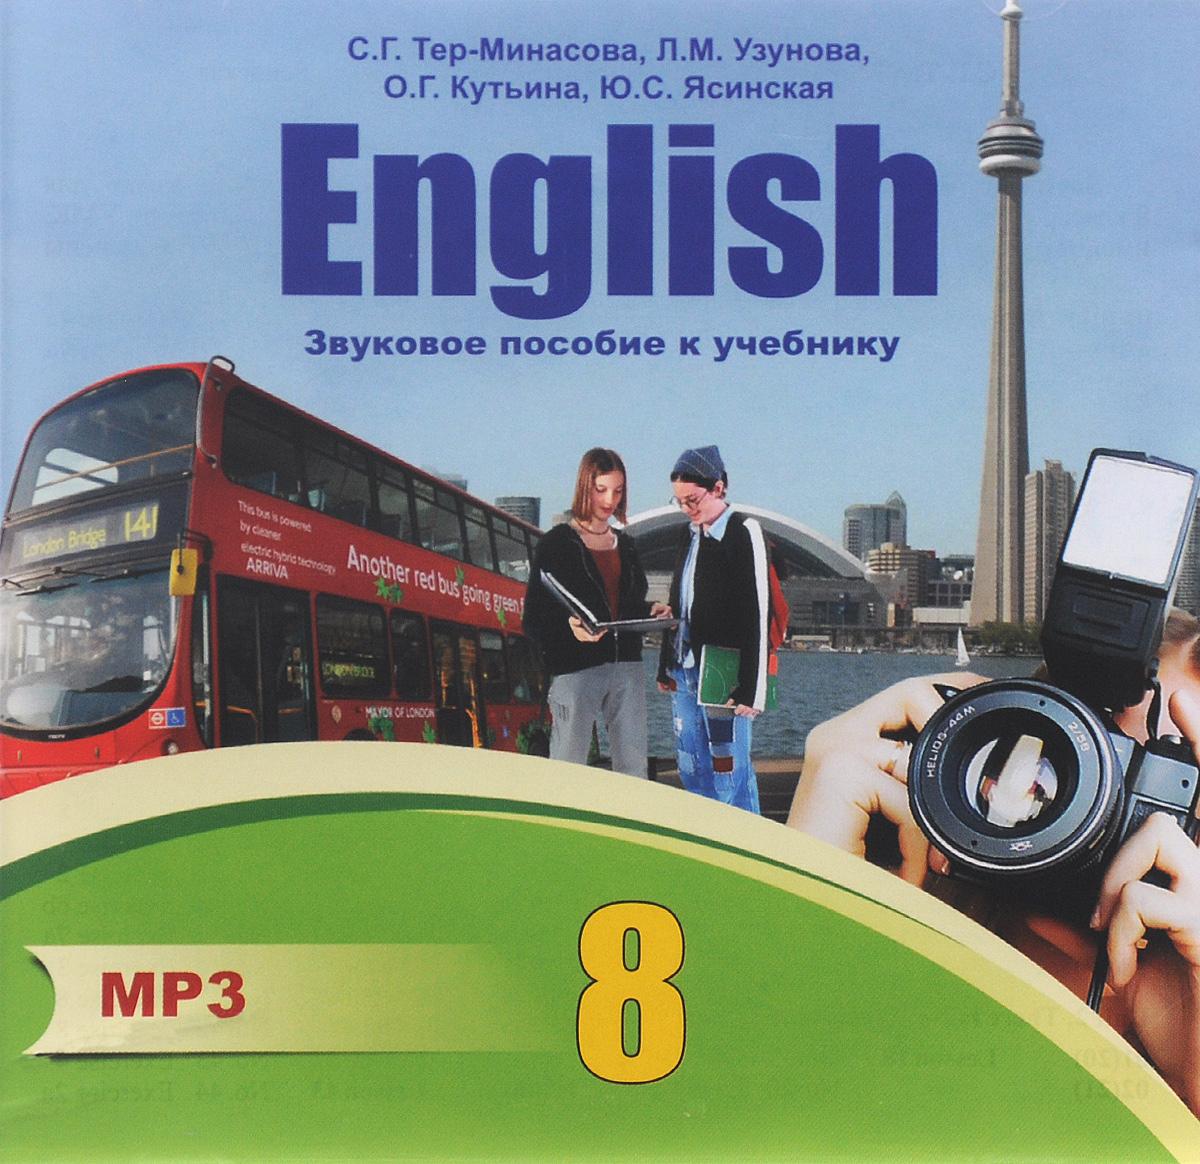 English 8 / Английский язык. 8 класс. Звуковое пособие к учебнику (аудиокурс на MP3)